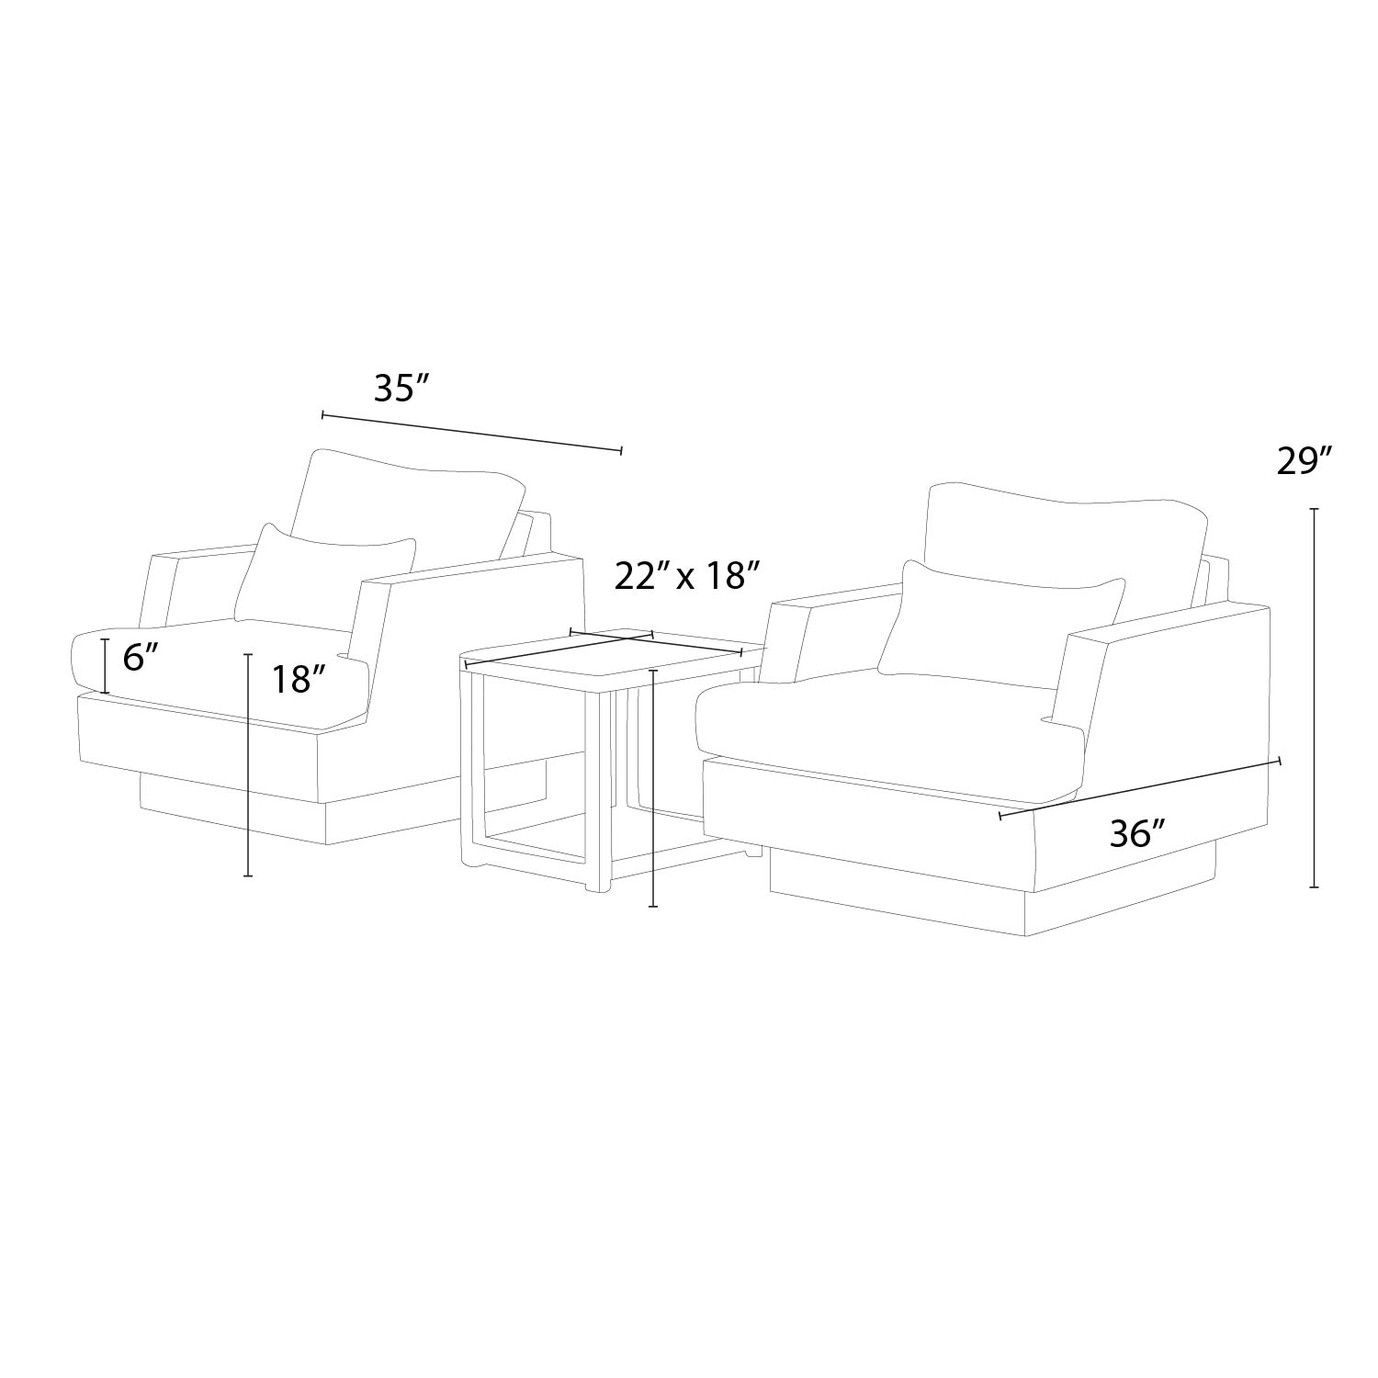 Portofino™ Comfort Club Chairs - Taupe Mist